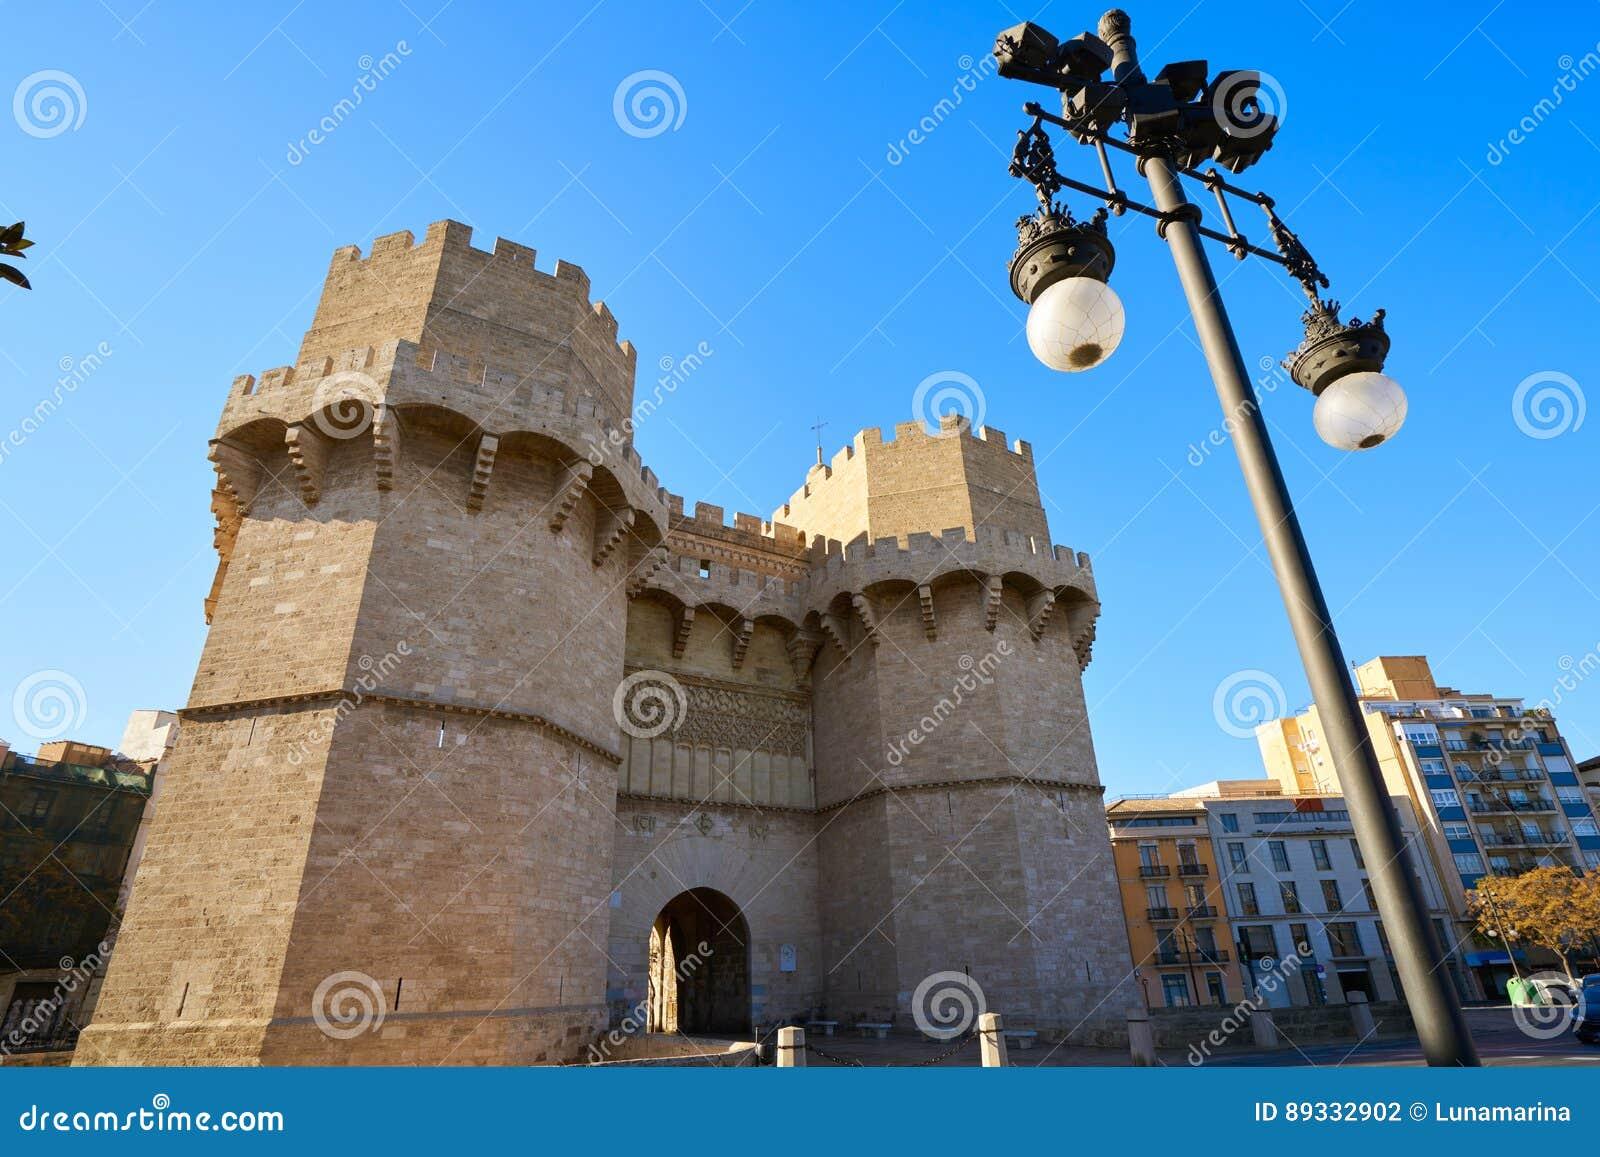 Torres De Serrano Towers In Valencia Stock Photo - Image: 89332902